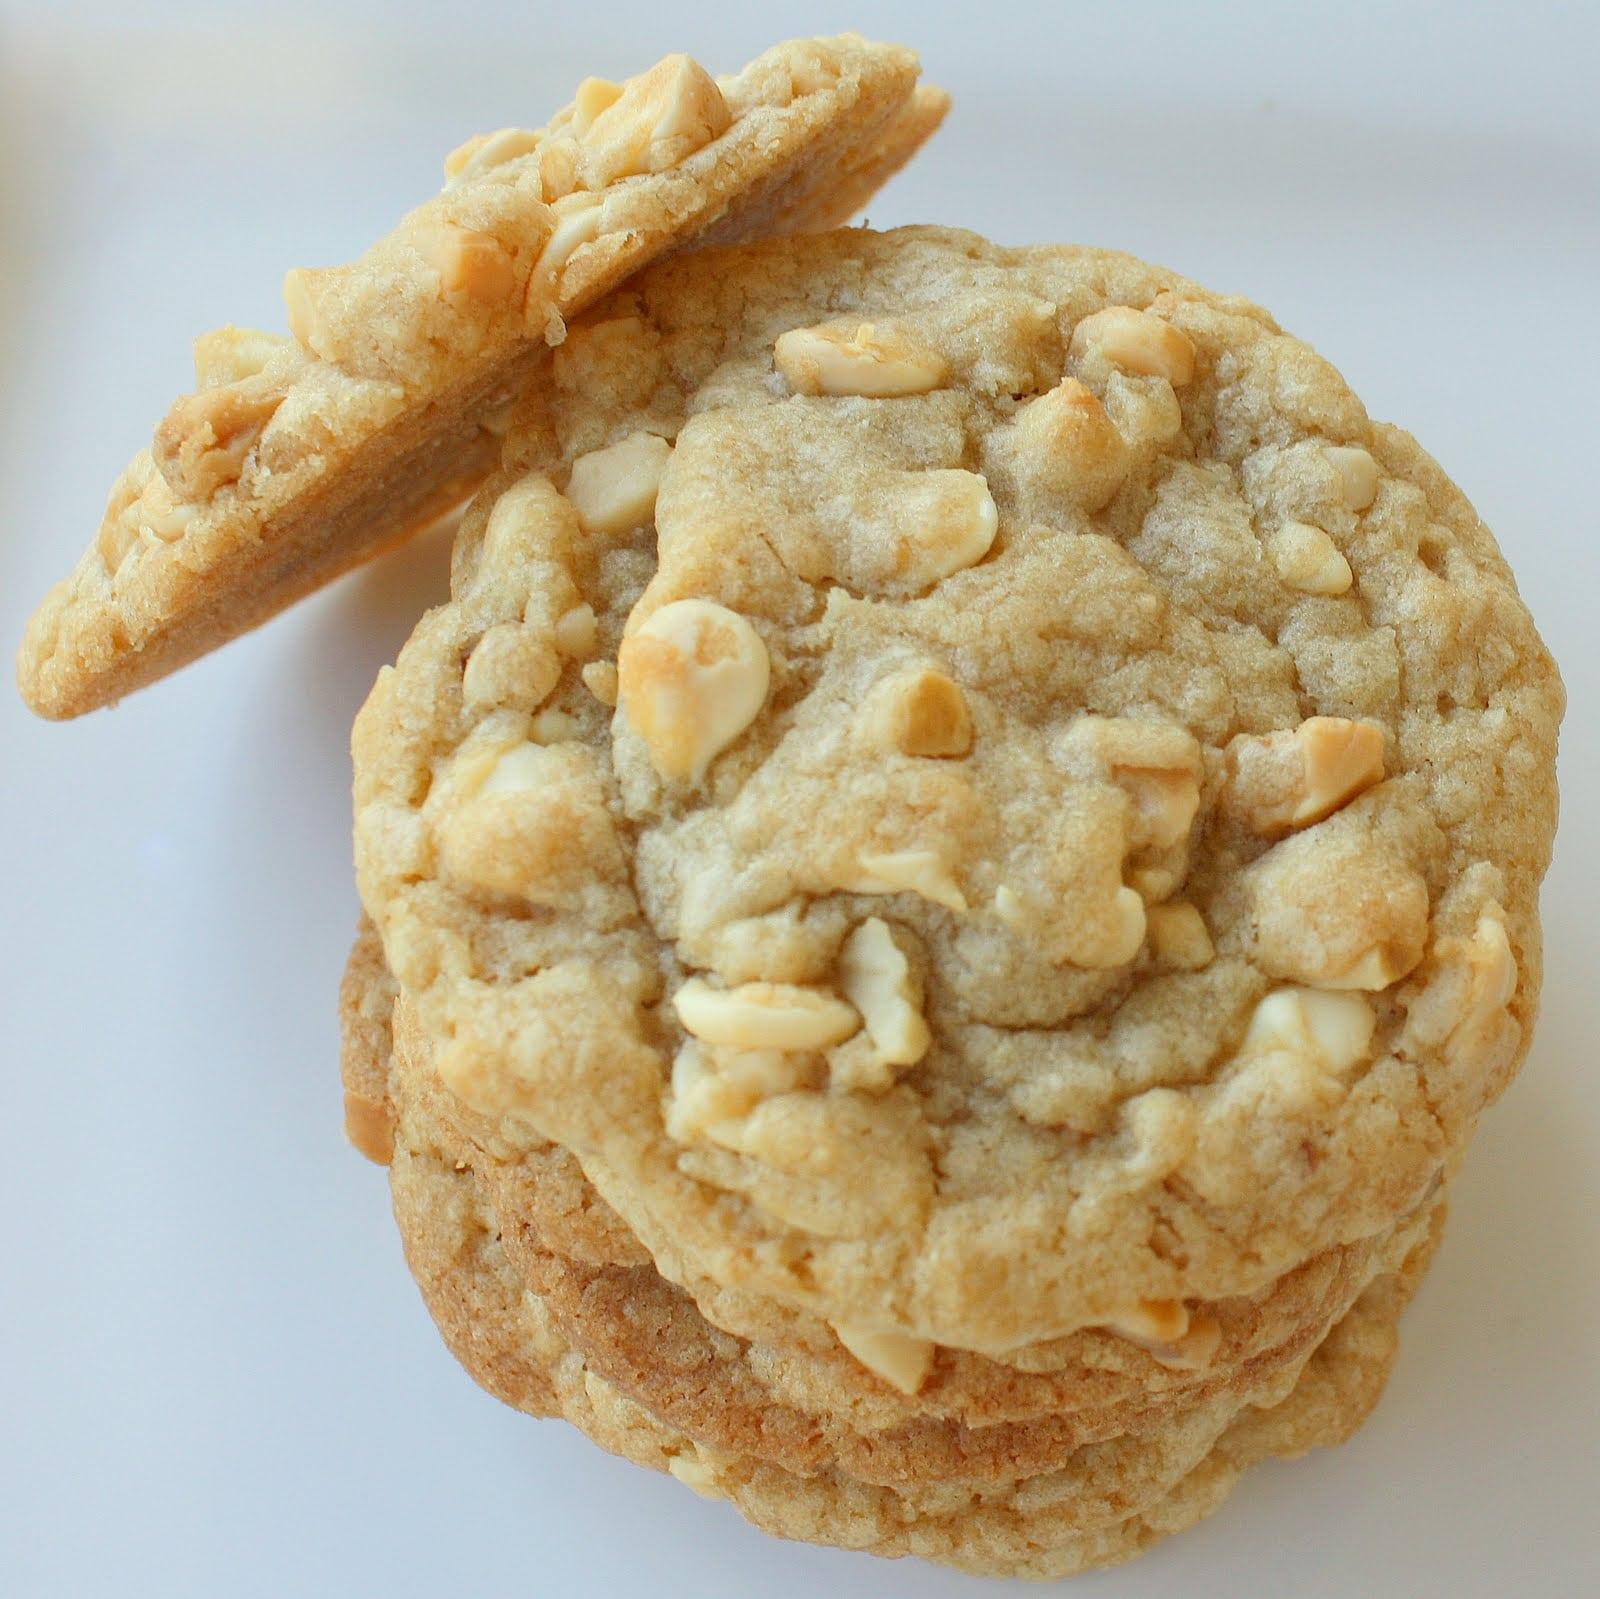 White Chocolate Macadamia Nut Cookies Photos